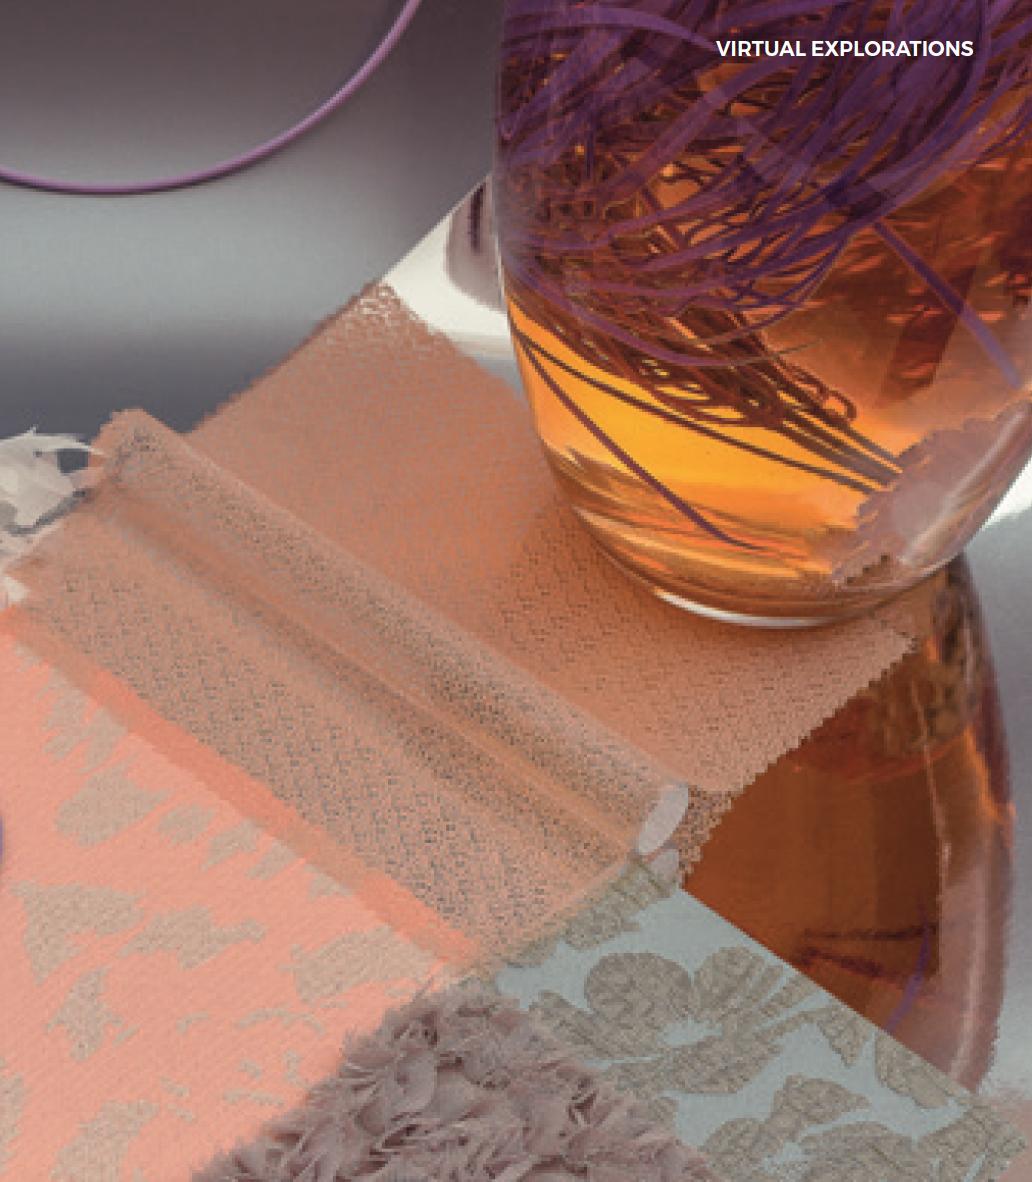 Heimtextil-trends-virtual-explorations-textiles